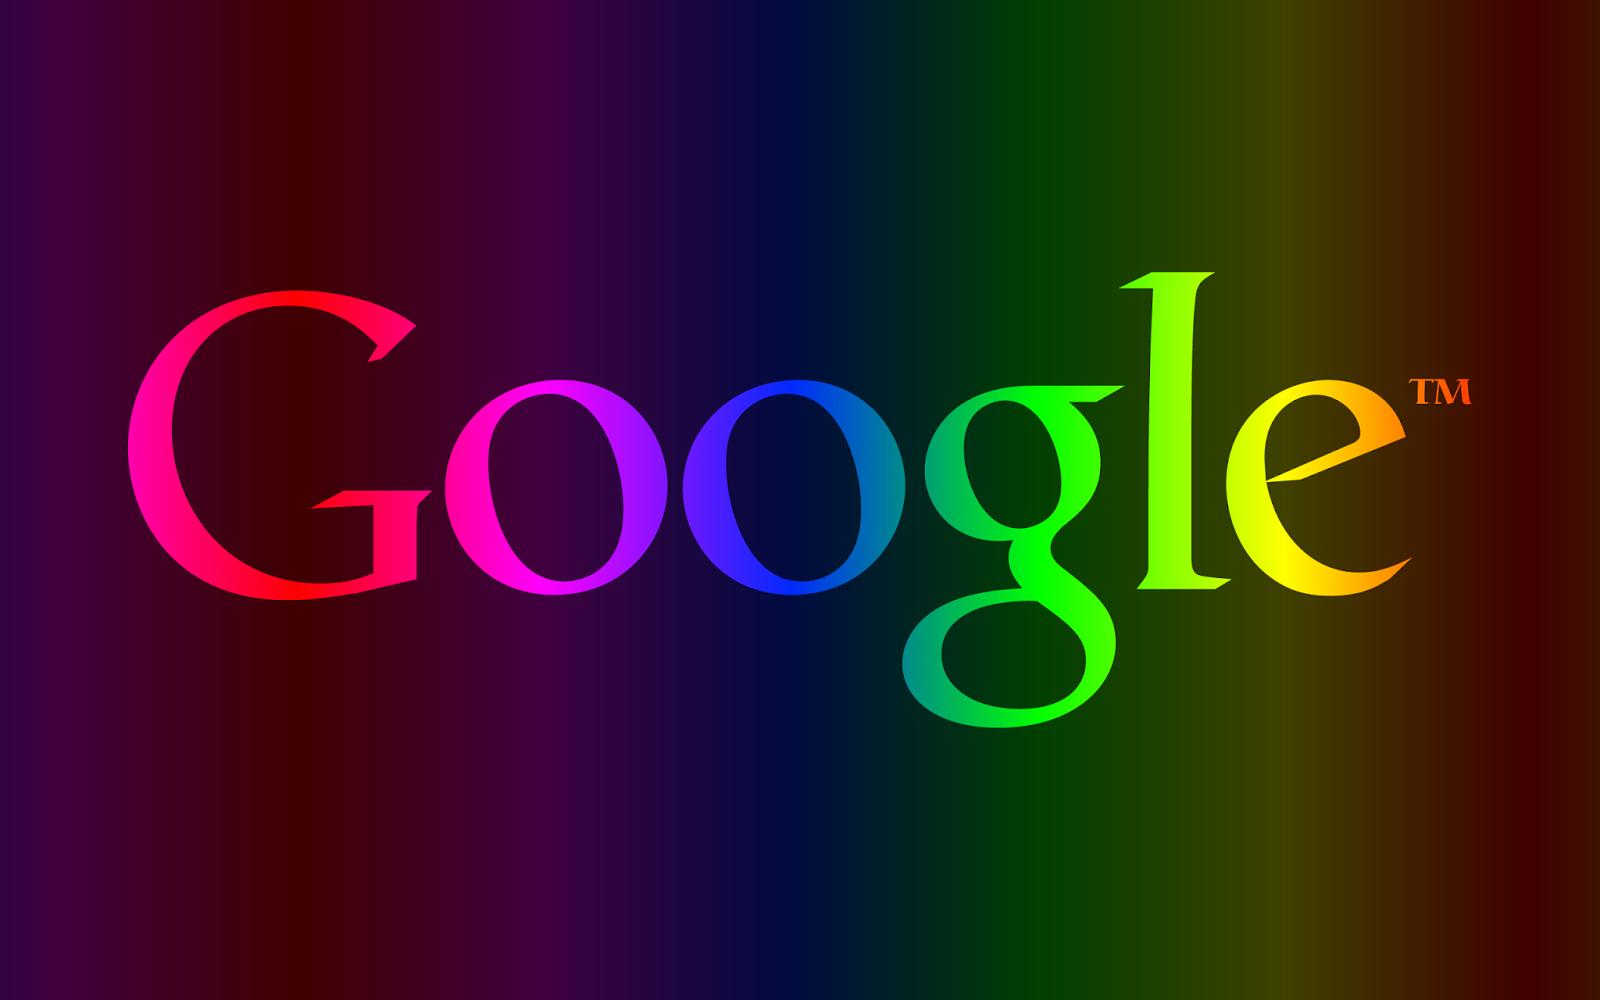 Google Desktop HD Wallpapers Soft Wallpapers 1600x1000